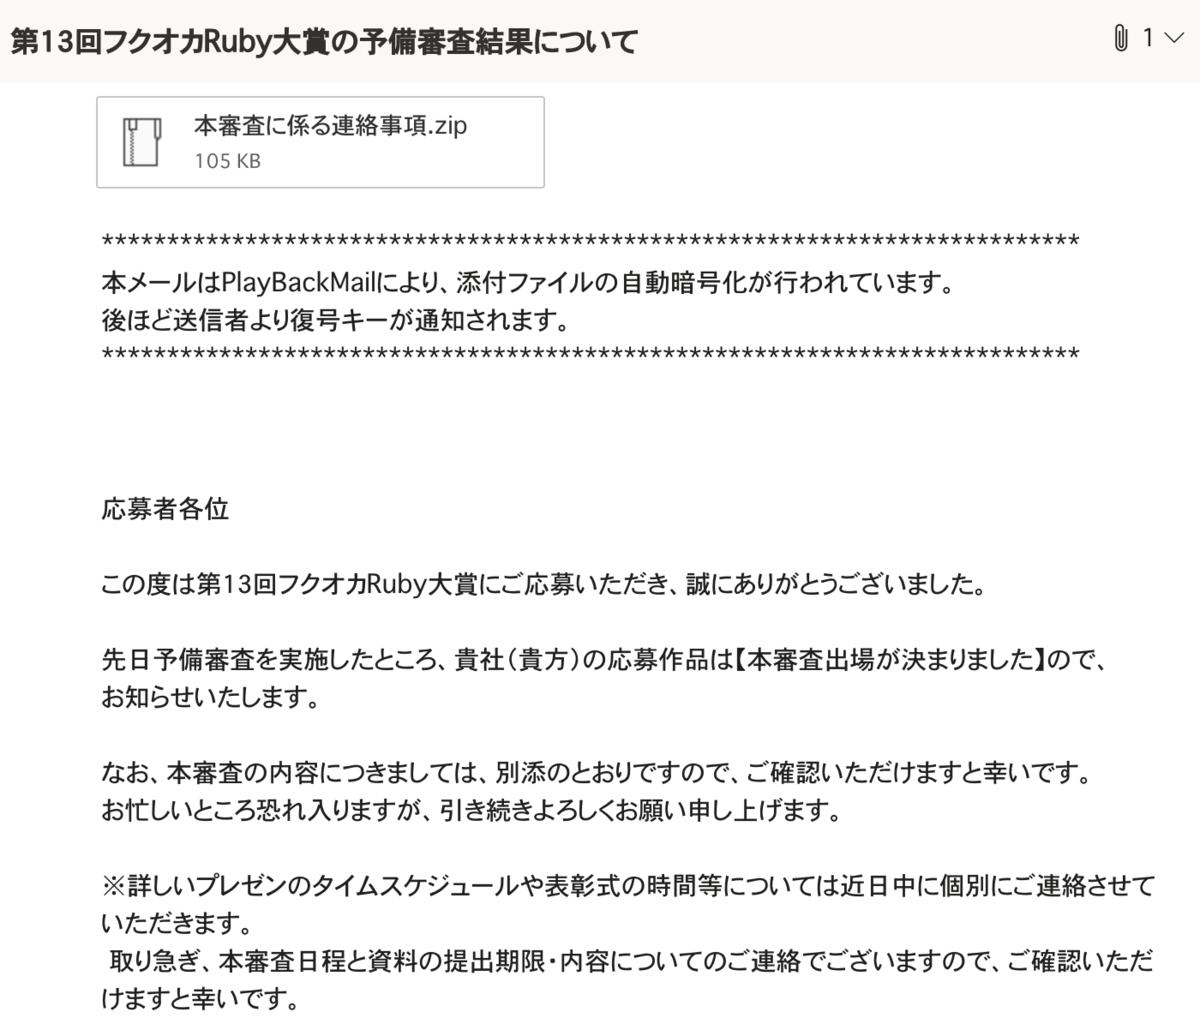 f:id:YusukeIwaki:20210124152918p:plain